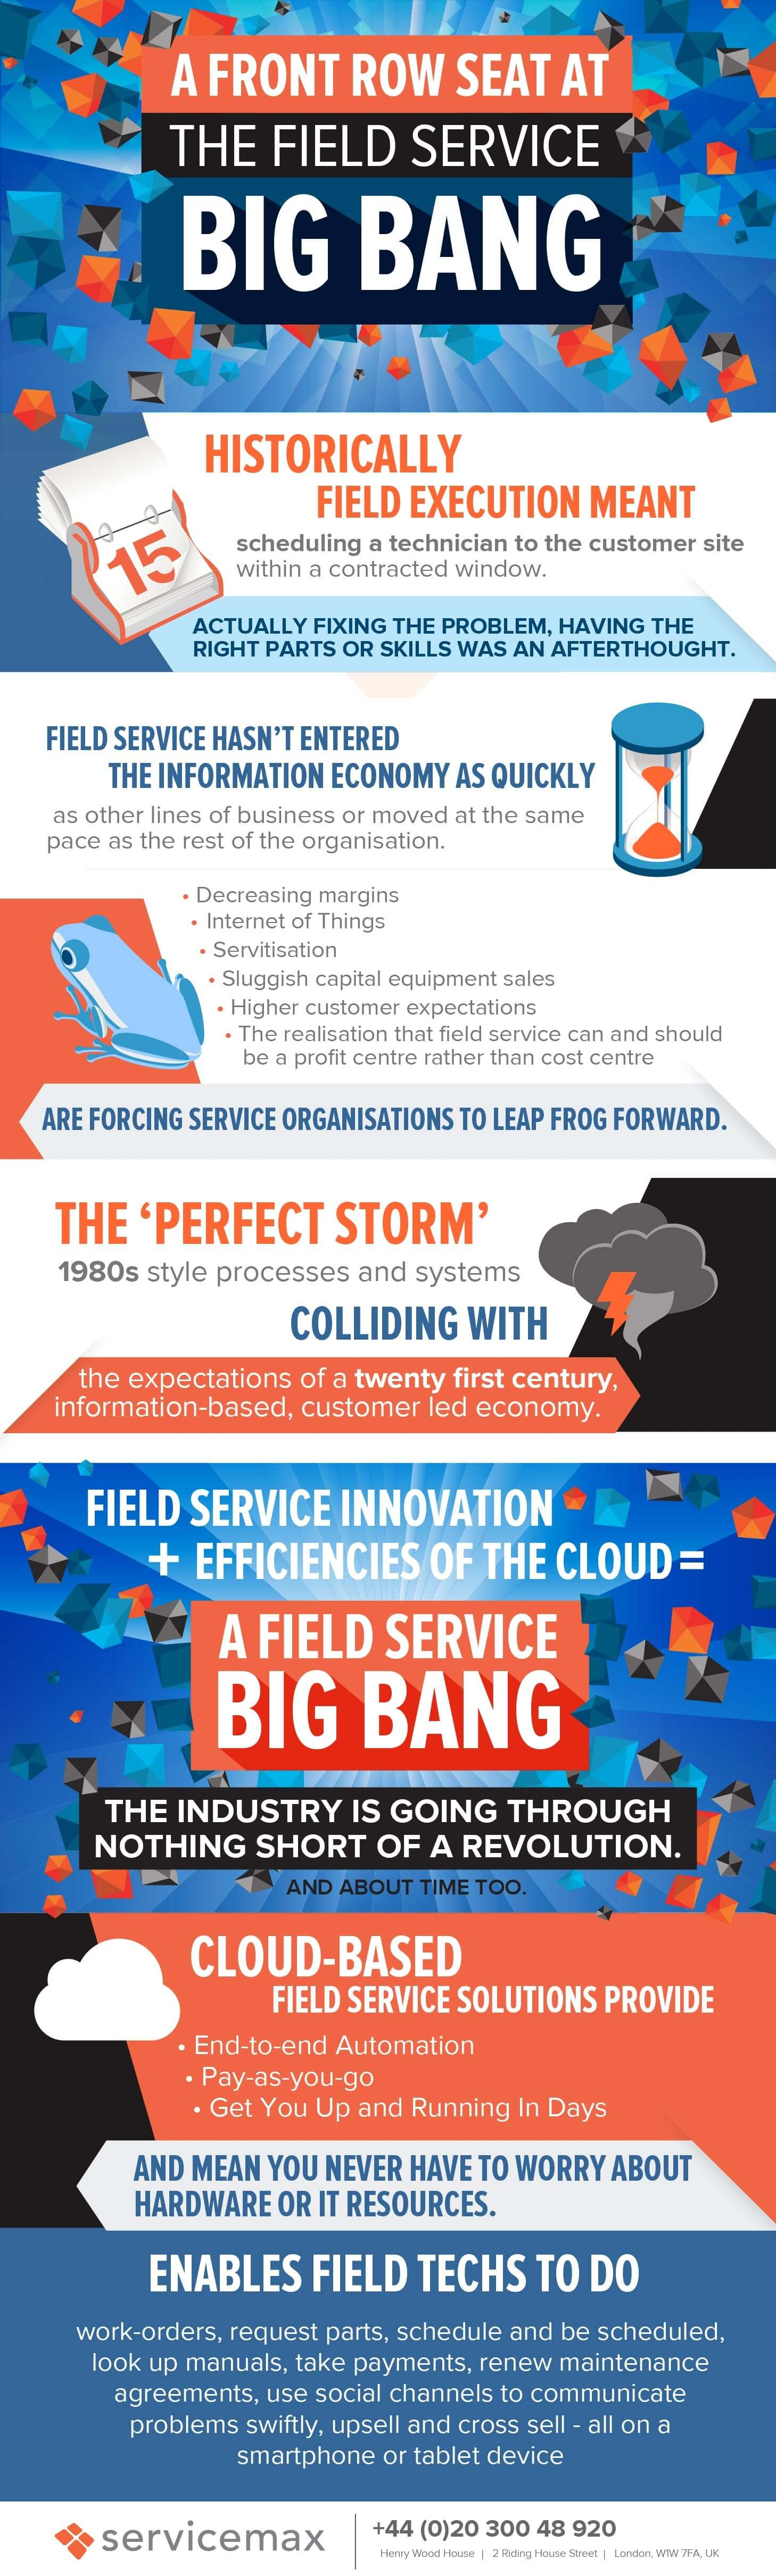 INFOGRAPHIC - Field Service Big Bang